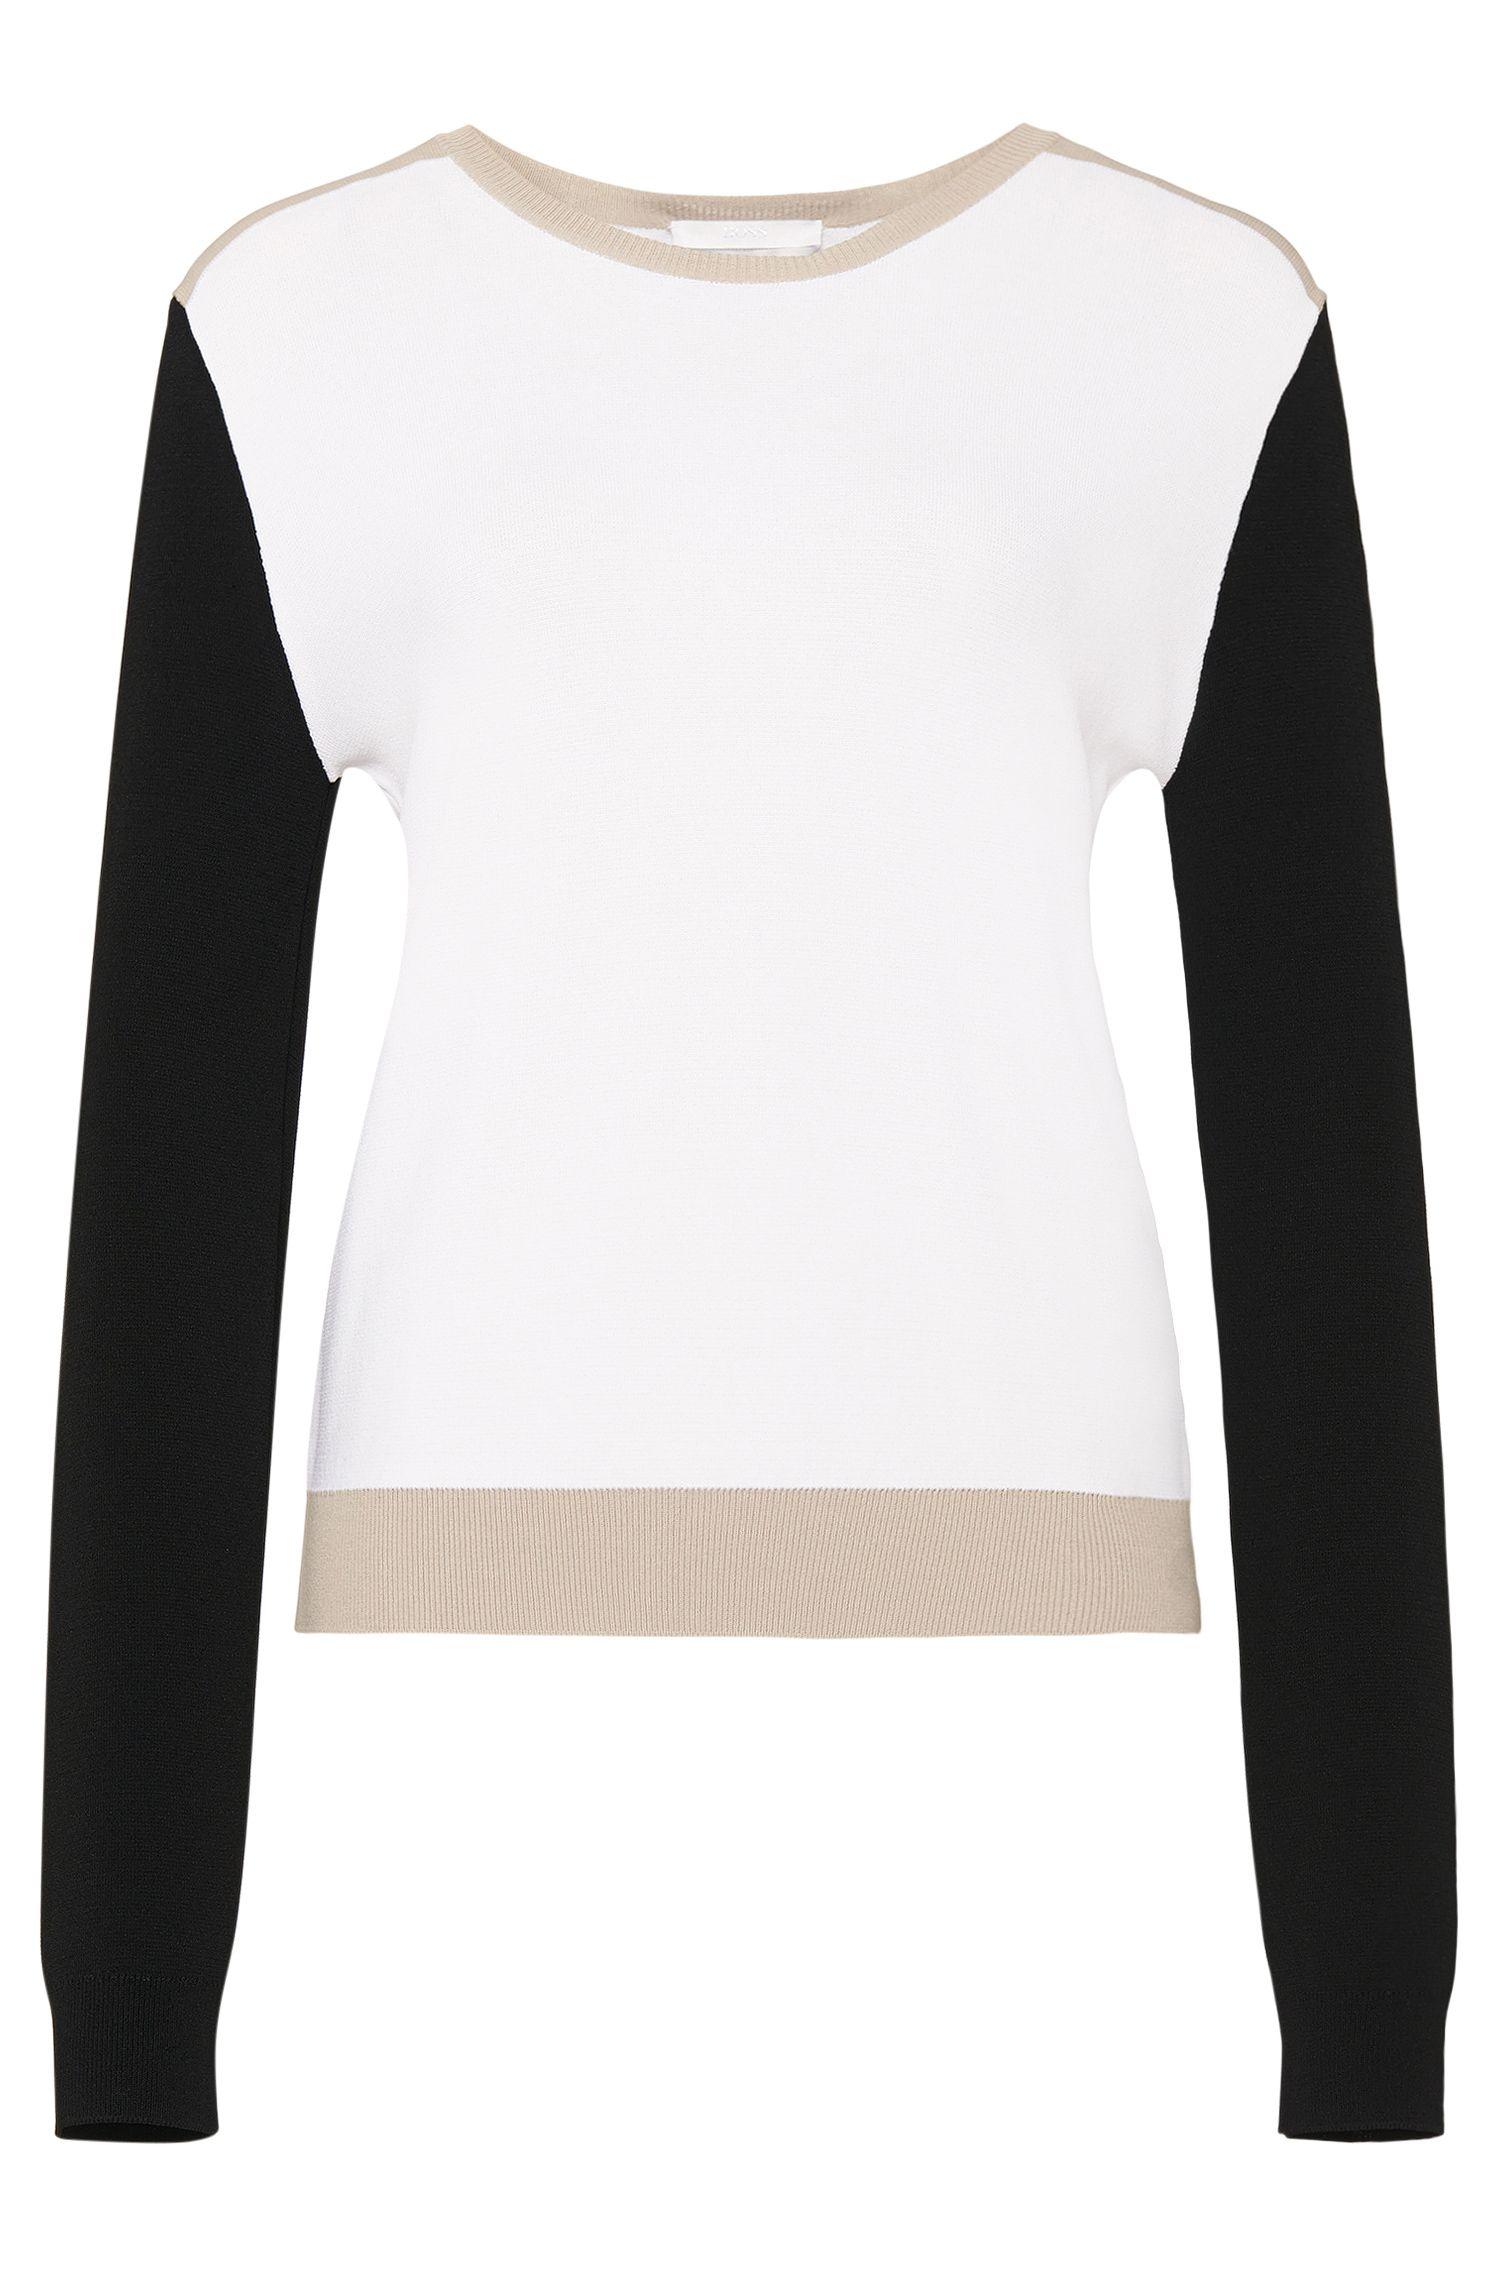 'Ferwina' | Colorblocked Sweater